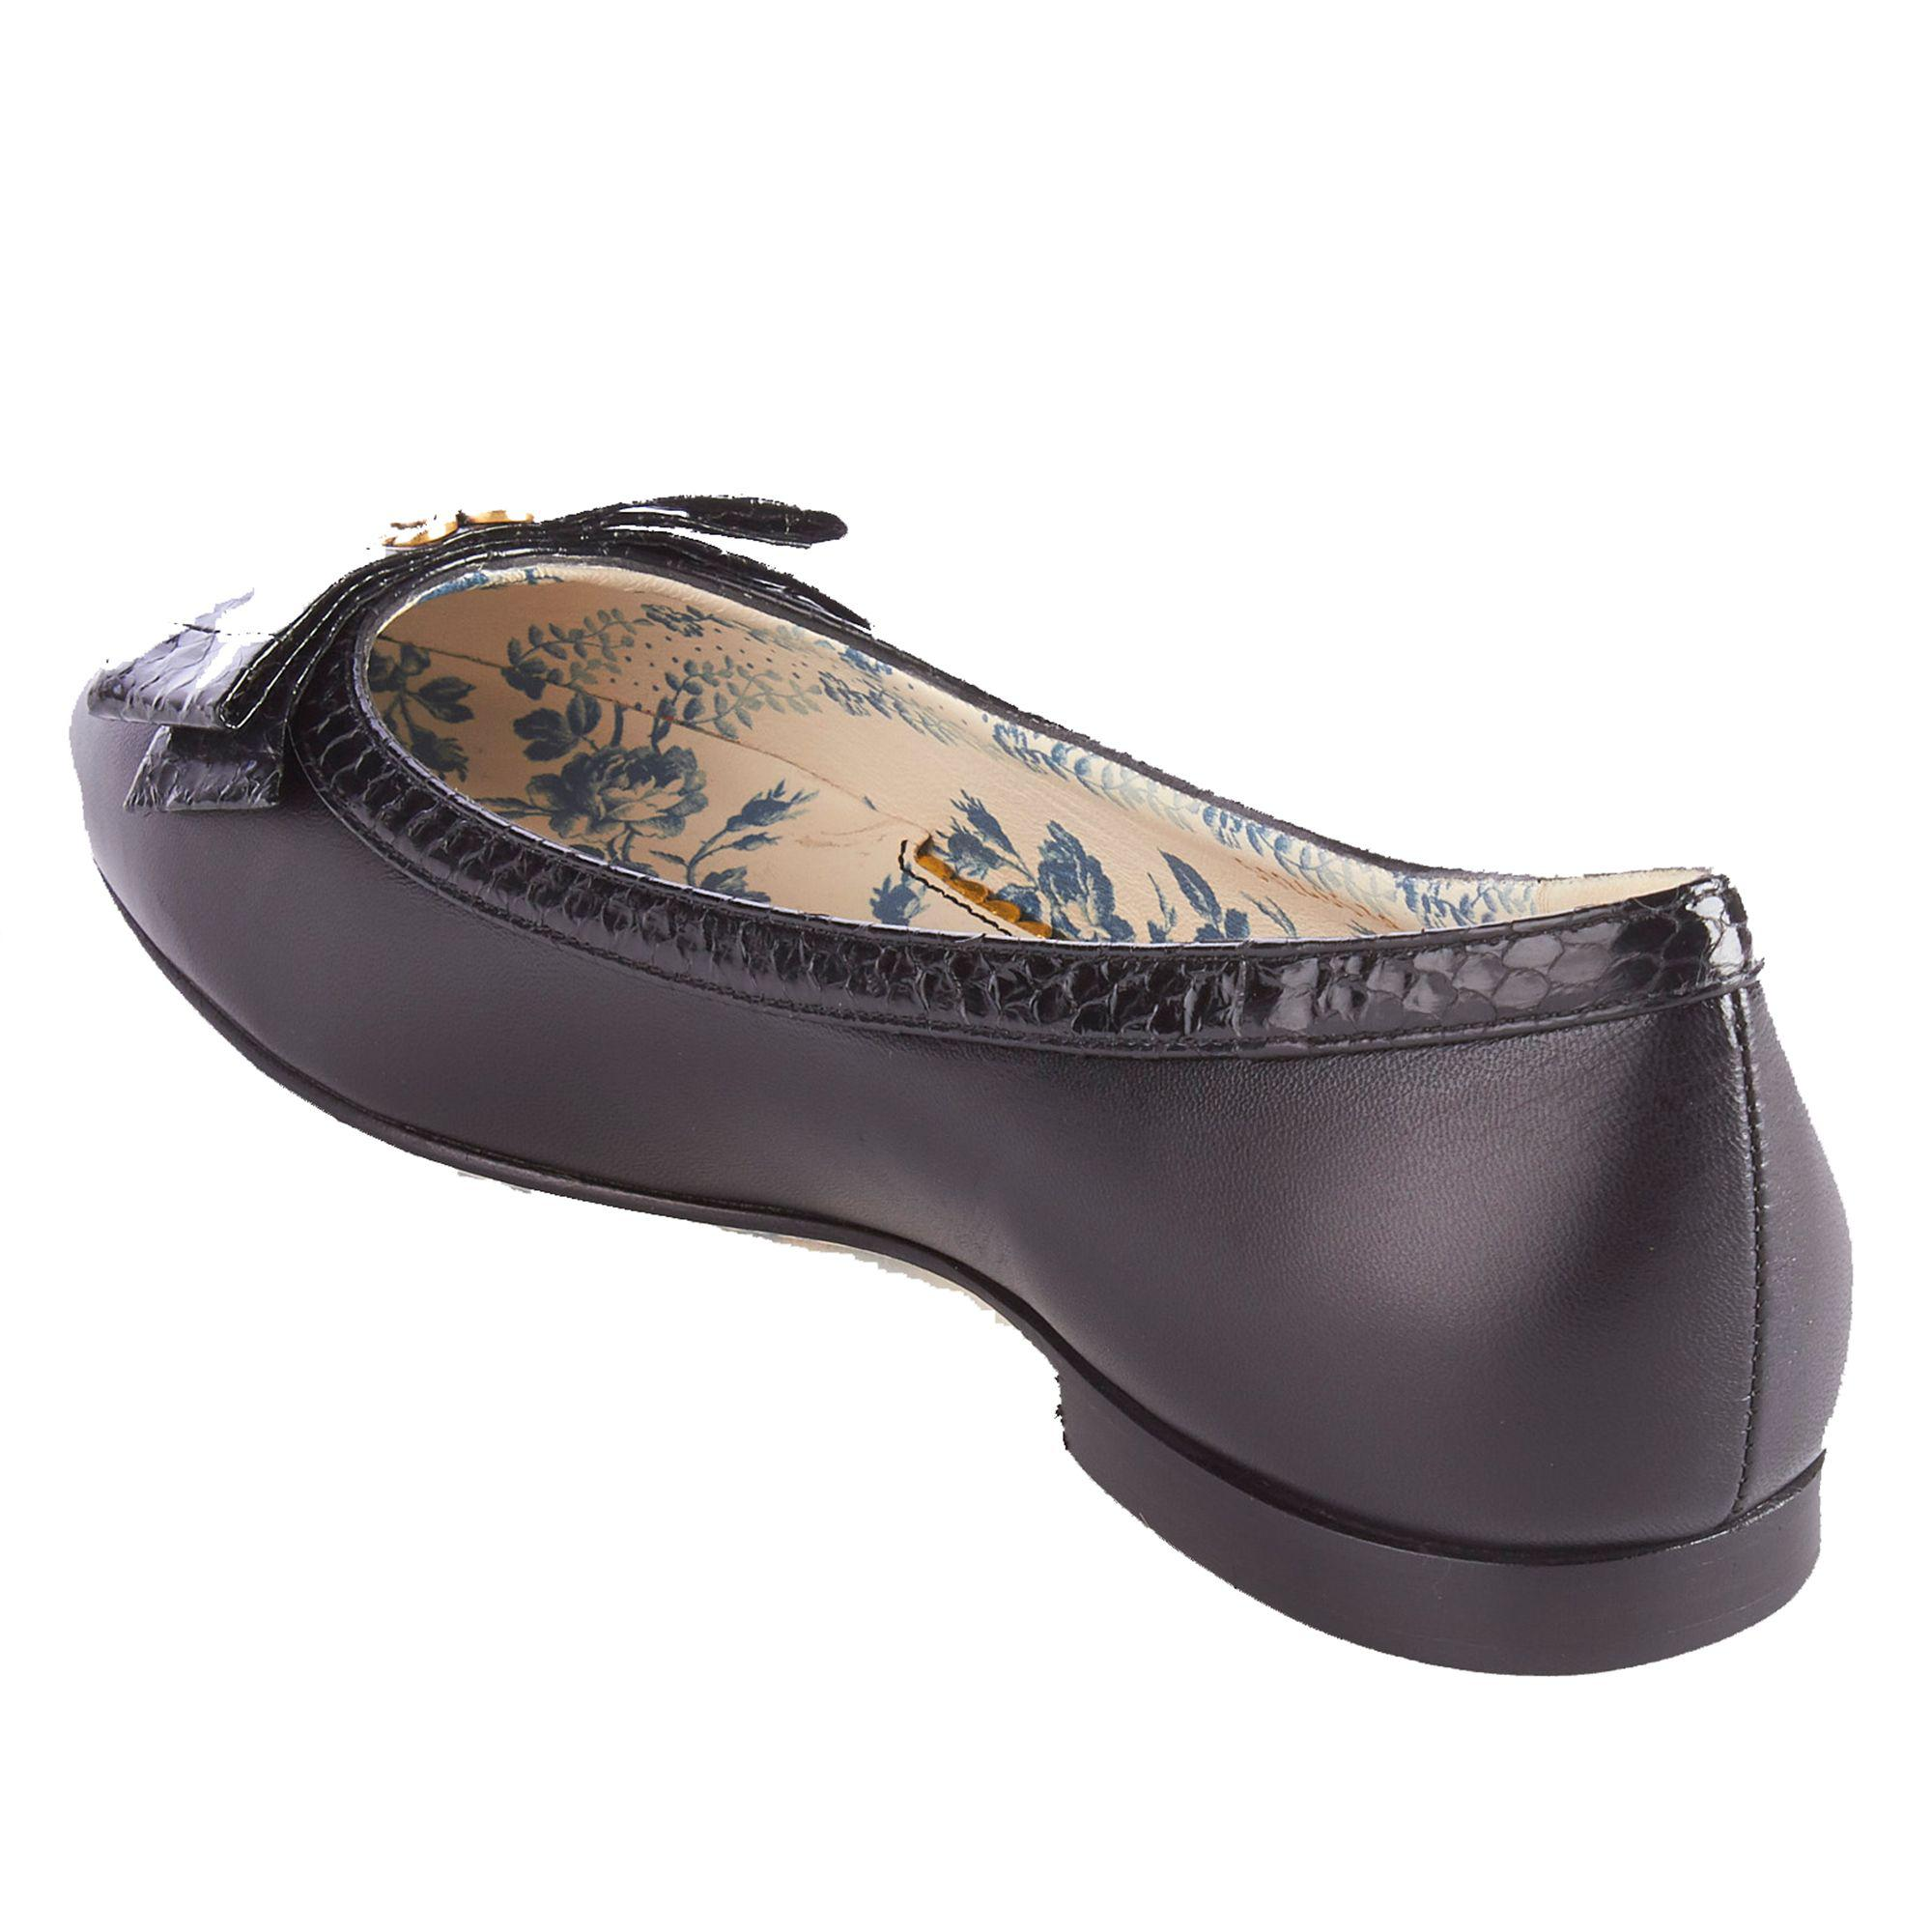 891288496 Gucci - Women s Leather Snakeskin Bow Ballet Flat Shoes Black - Lyst. View  fullscreen